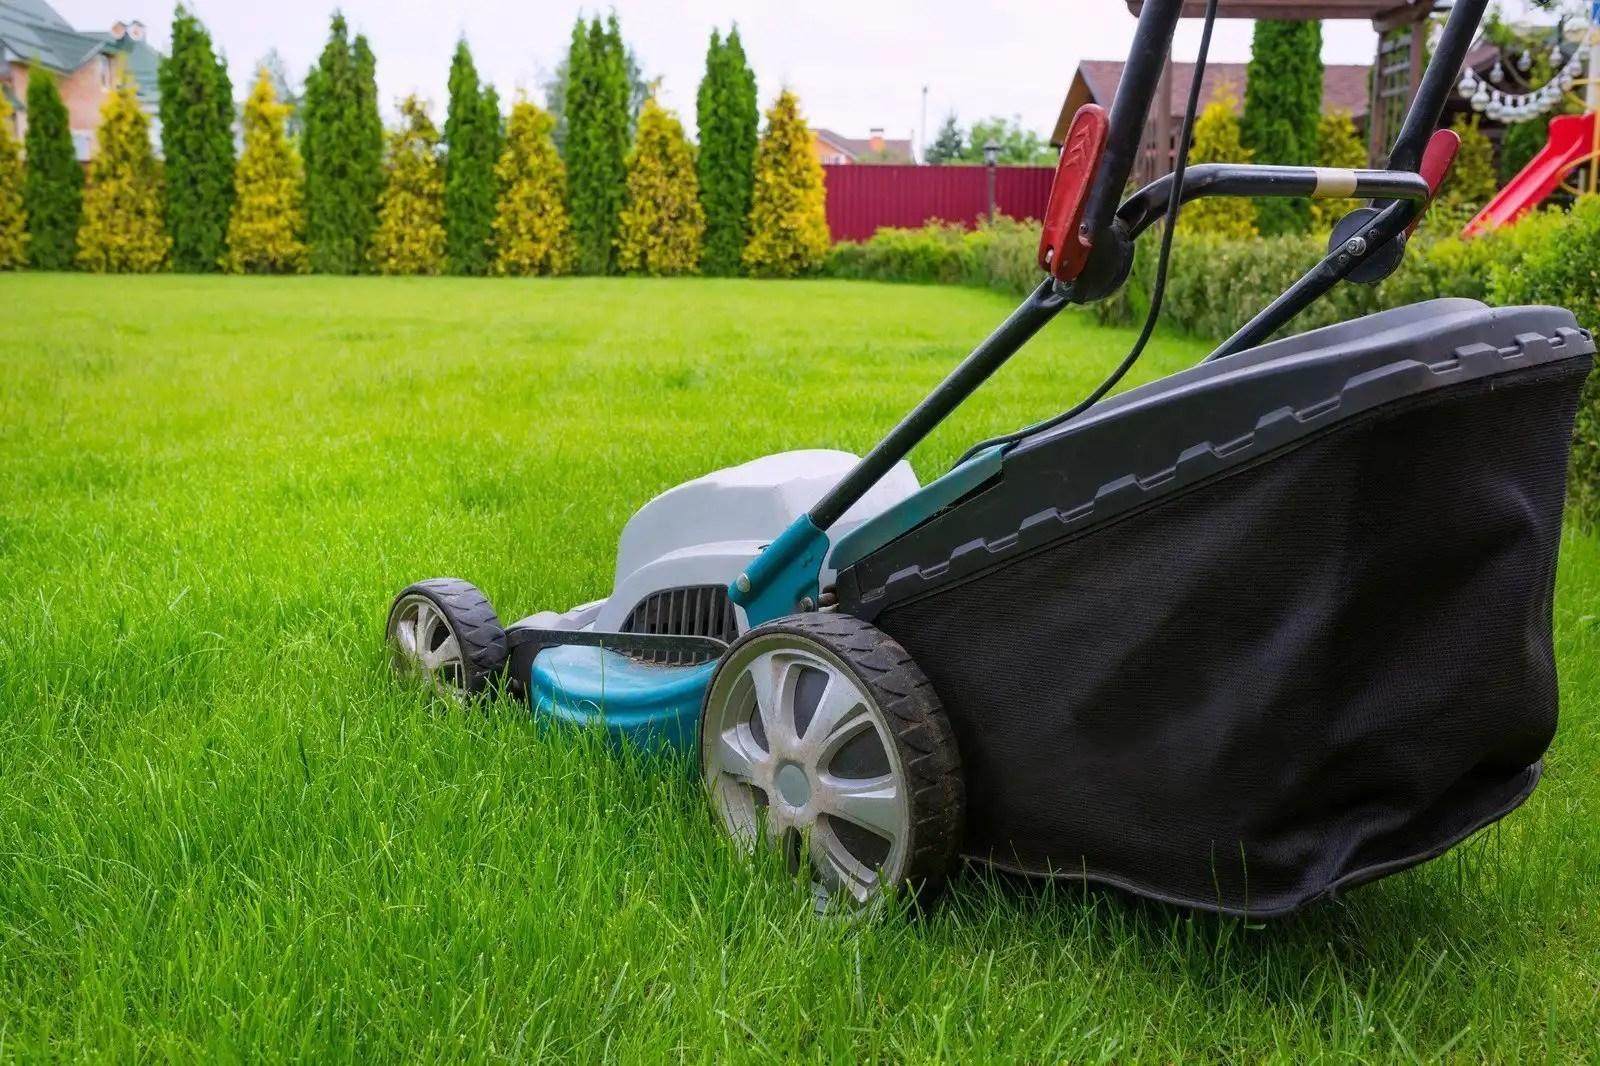 electric lawn mower cutting grass in yard